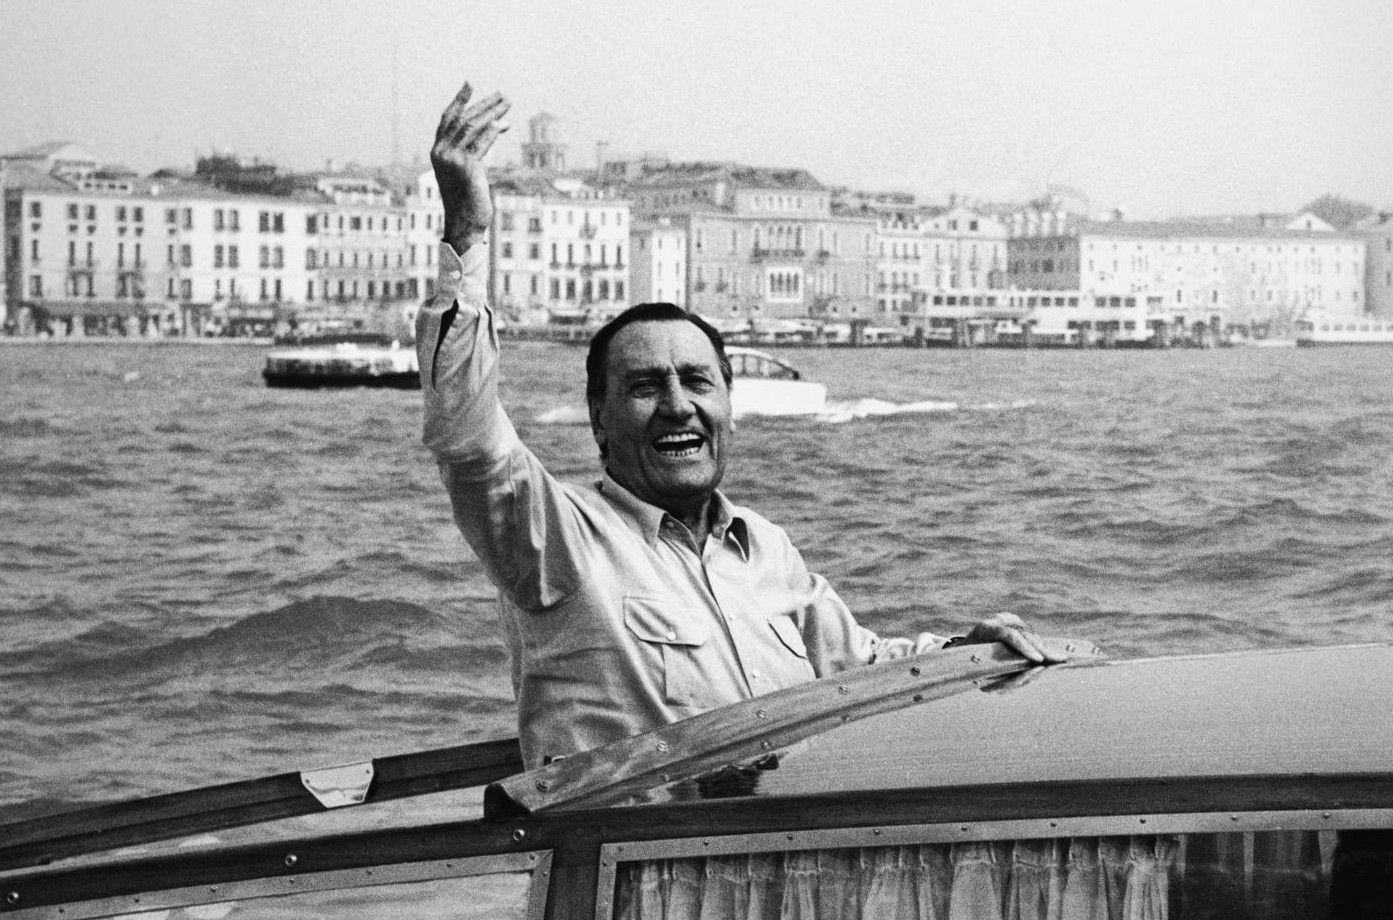 Alberto Sordi Le Frasi Celebri Dei Suoi Film Nanopress